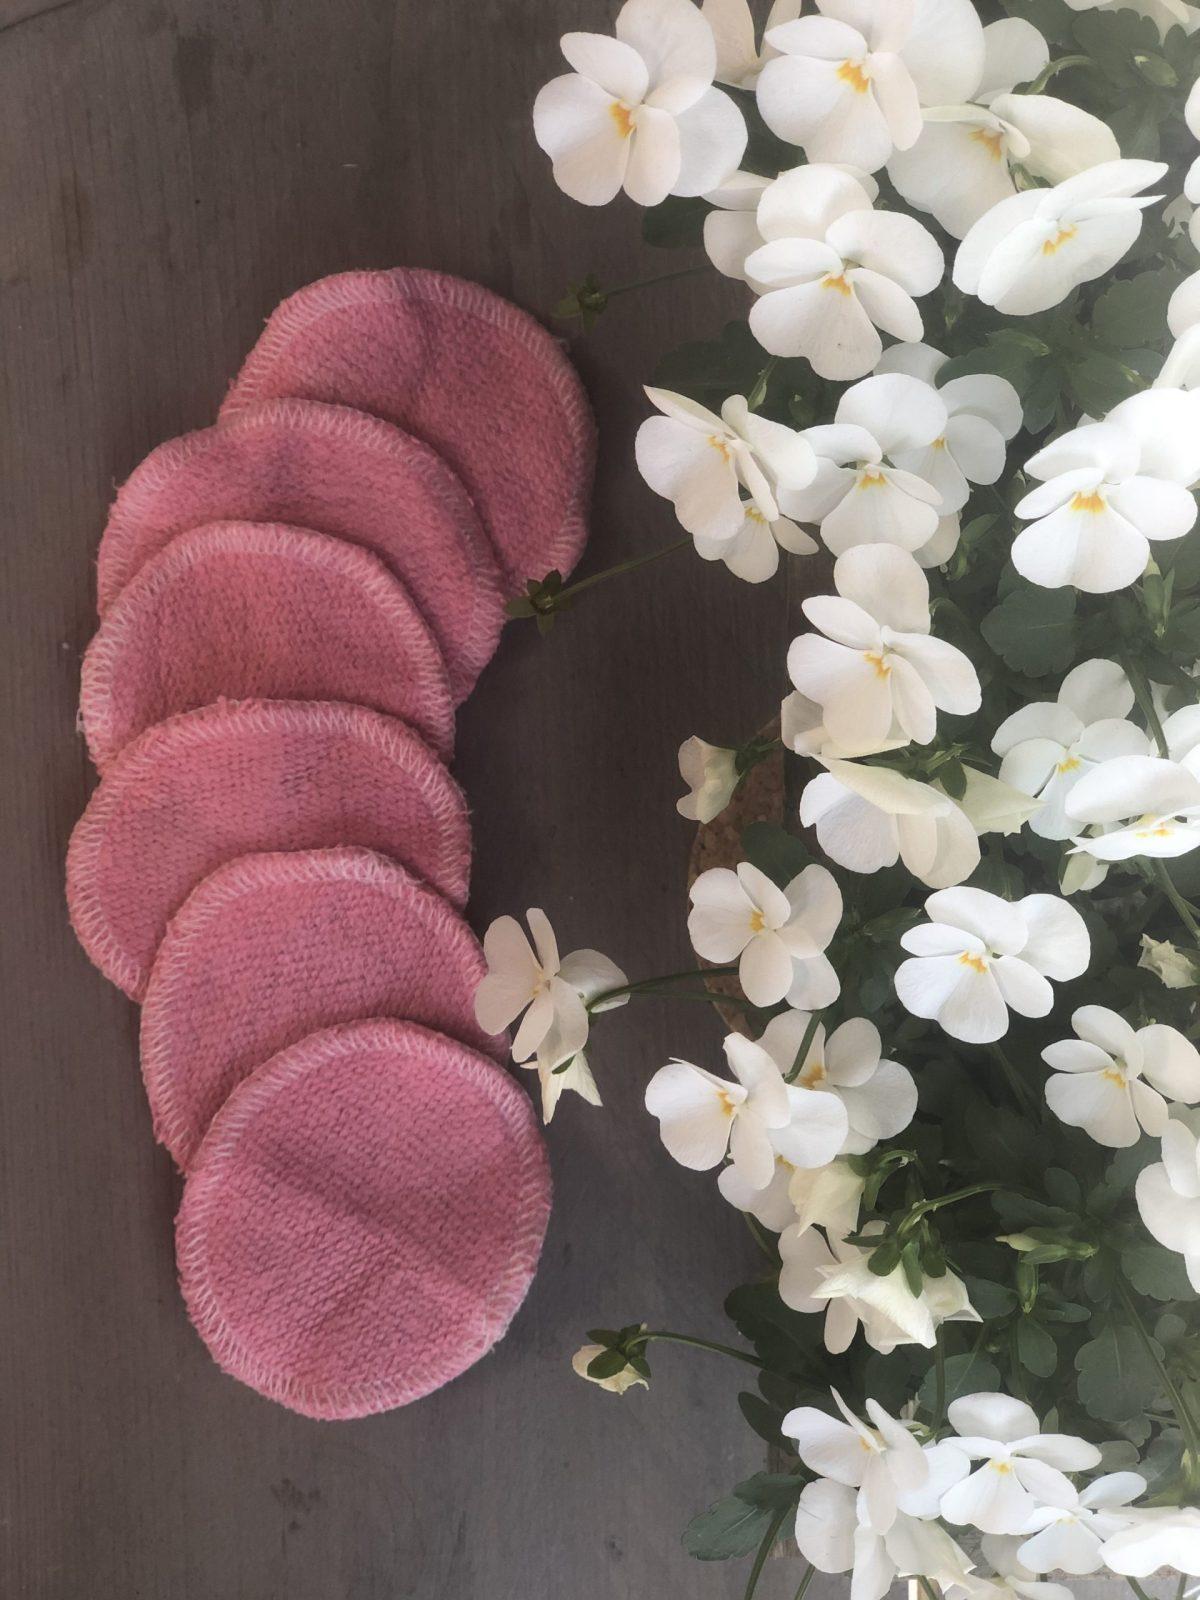 A zero waste alternative to cotton pads